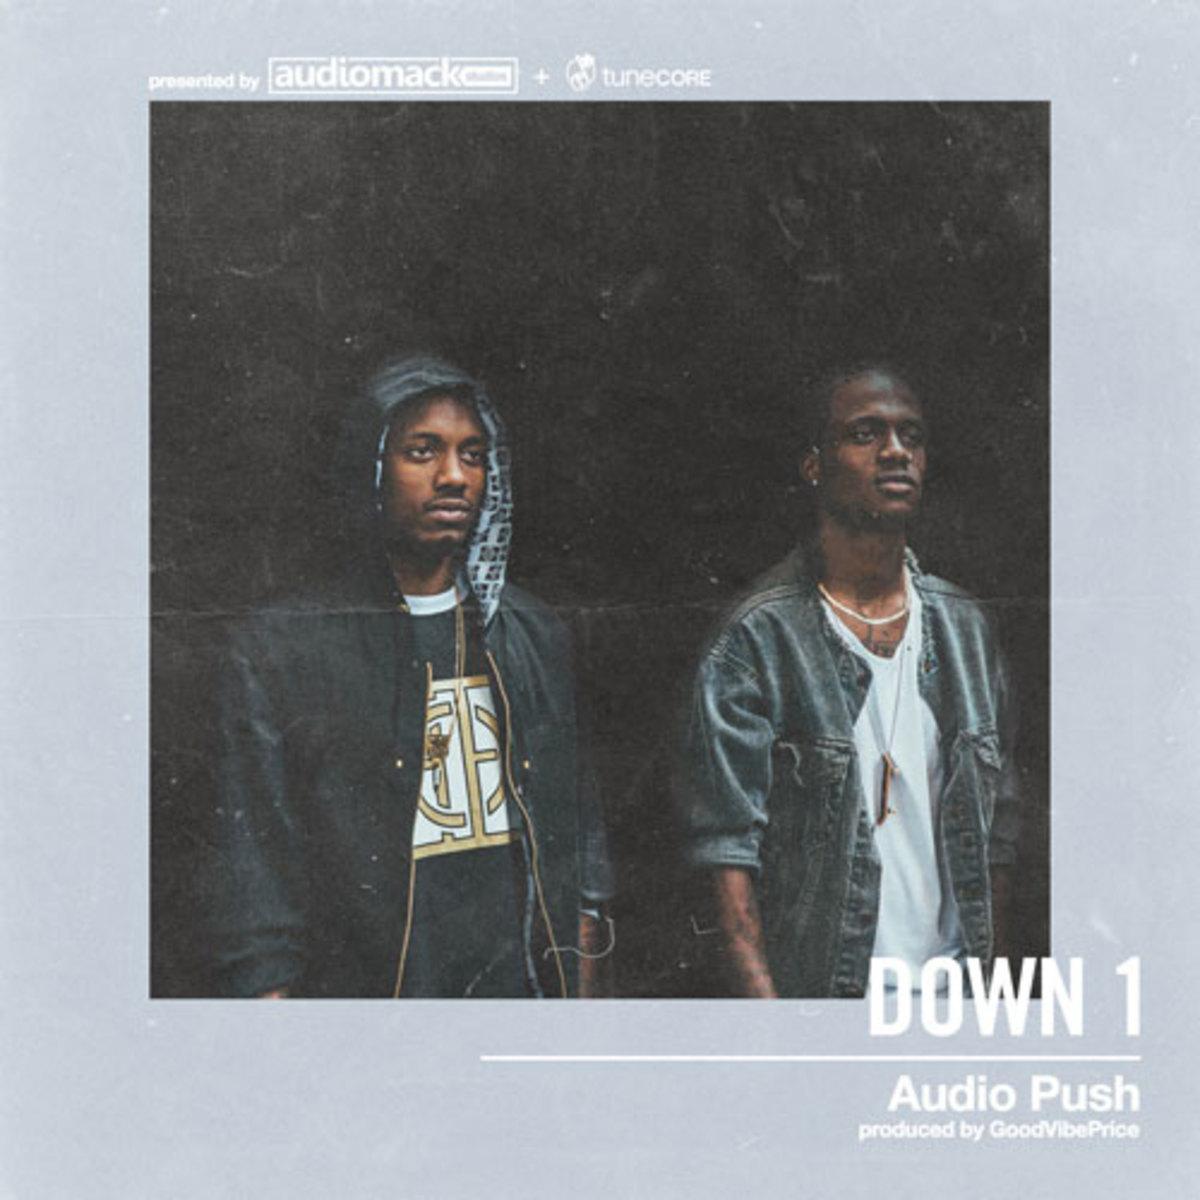 audio-push-down-1-freestyle-art.jpg